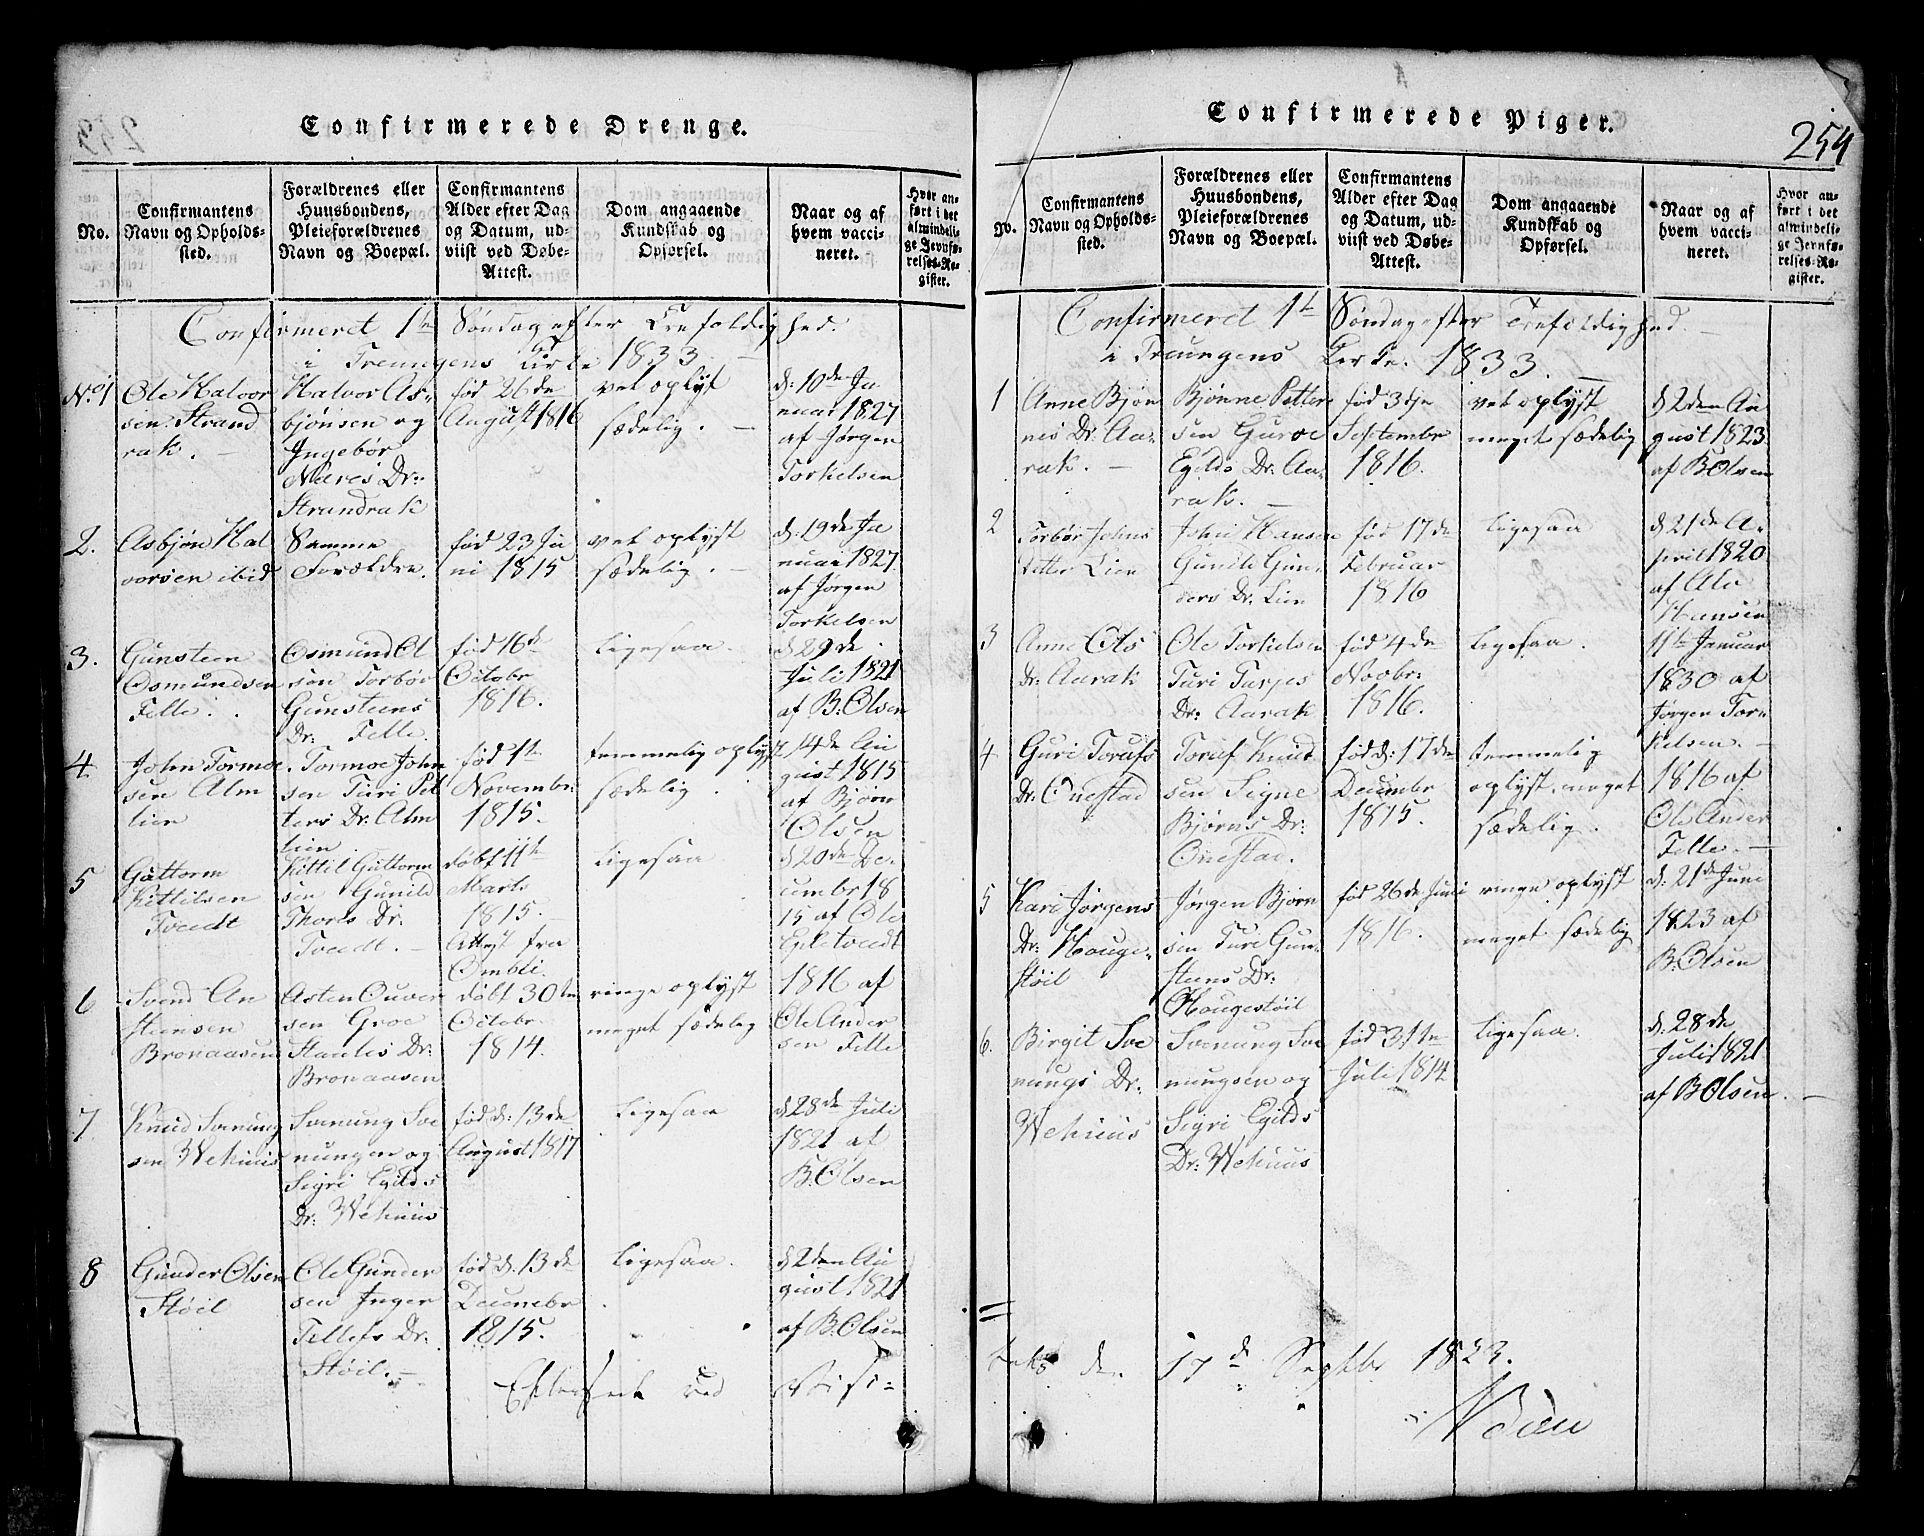 SAKO, Nissedal kirkebøker, G/Gb/L0001: Klokkerbok nr. II 1, 1814-1862, s. 254